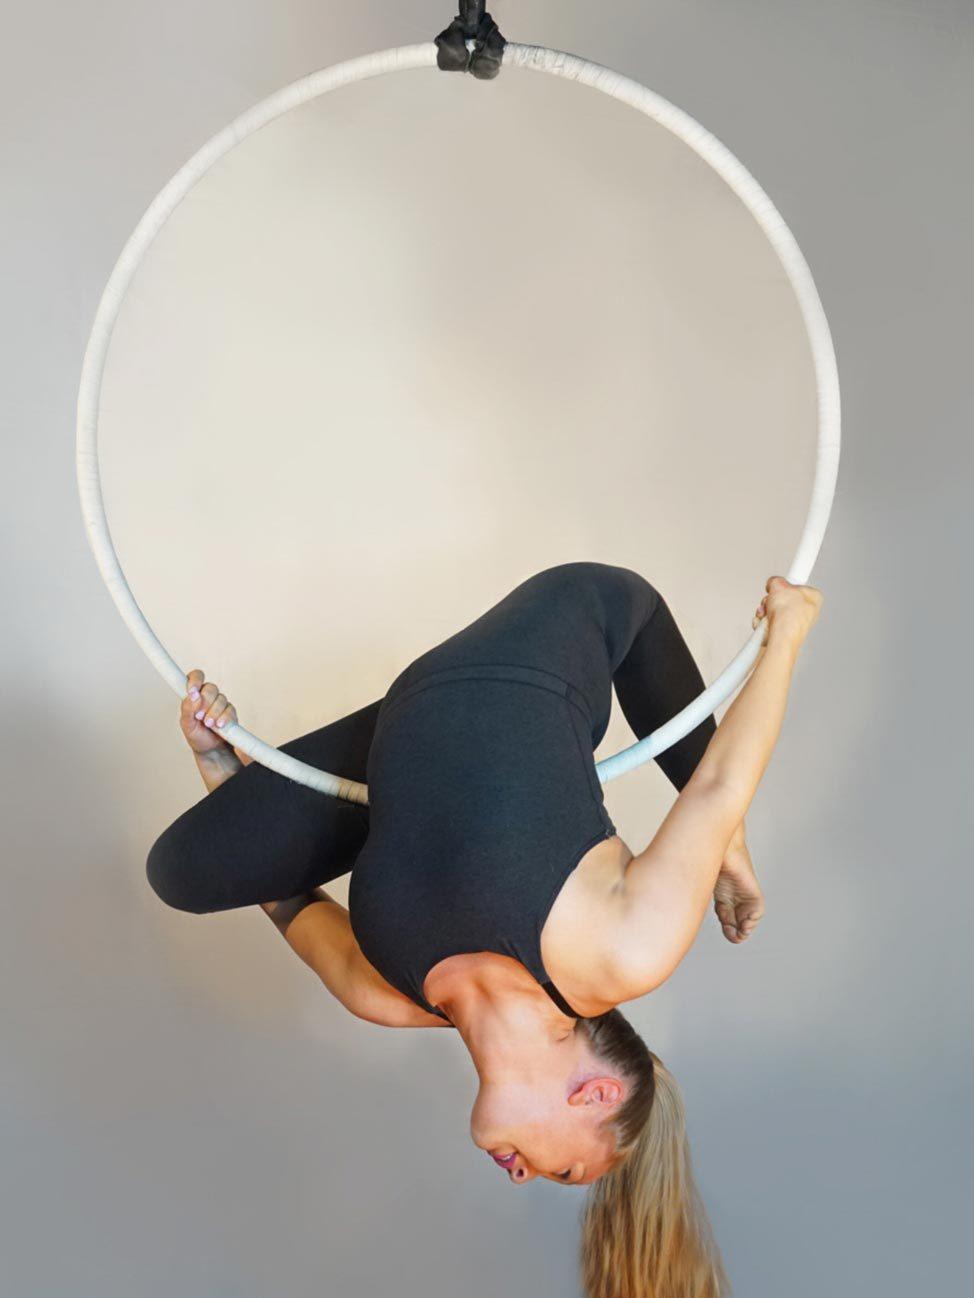 Aerial Arts Photoshoot at Good Karma Studio in Albany, New York